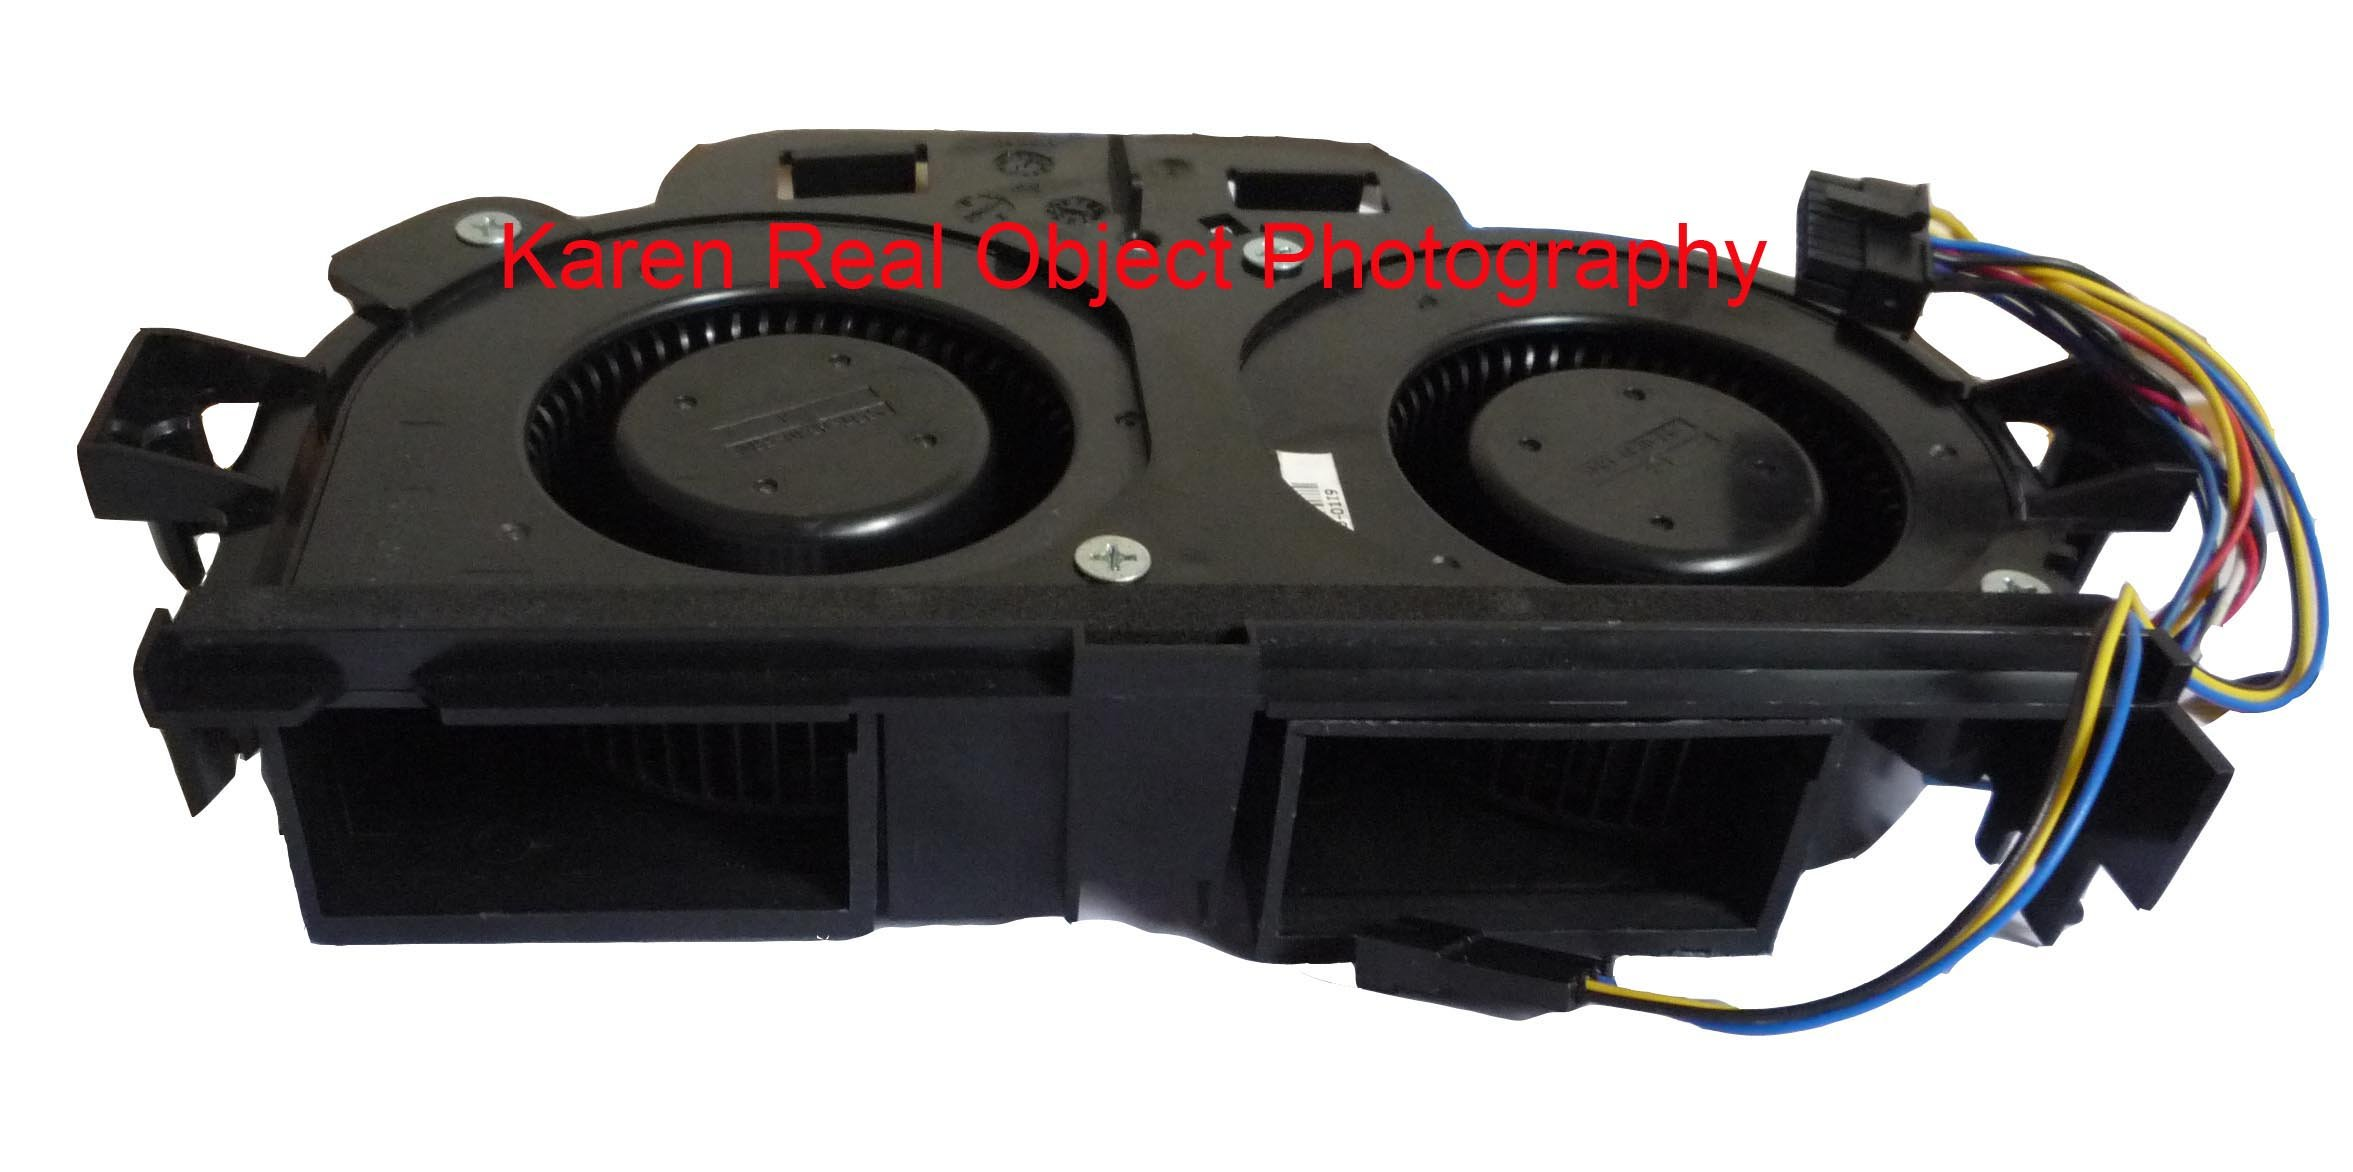 NMB 97*94*33mm BG0903-B049-POS 12V 2.65A Blower Cooling Fan 1set(2pcs) free shipping new original sanyo 9bam24p2g17 dc24v 0 9a 97 33mm 9cm large wind blower cooling fan